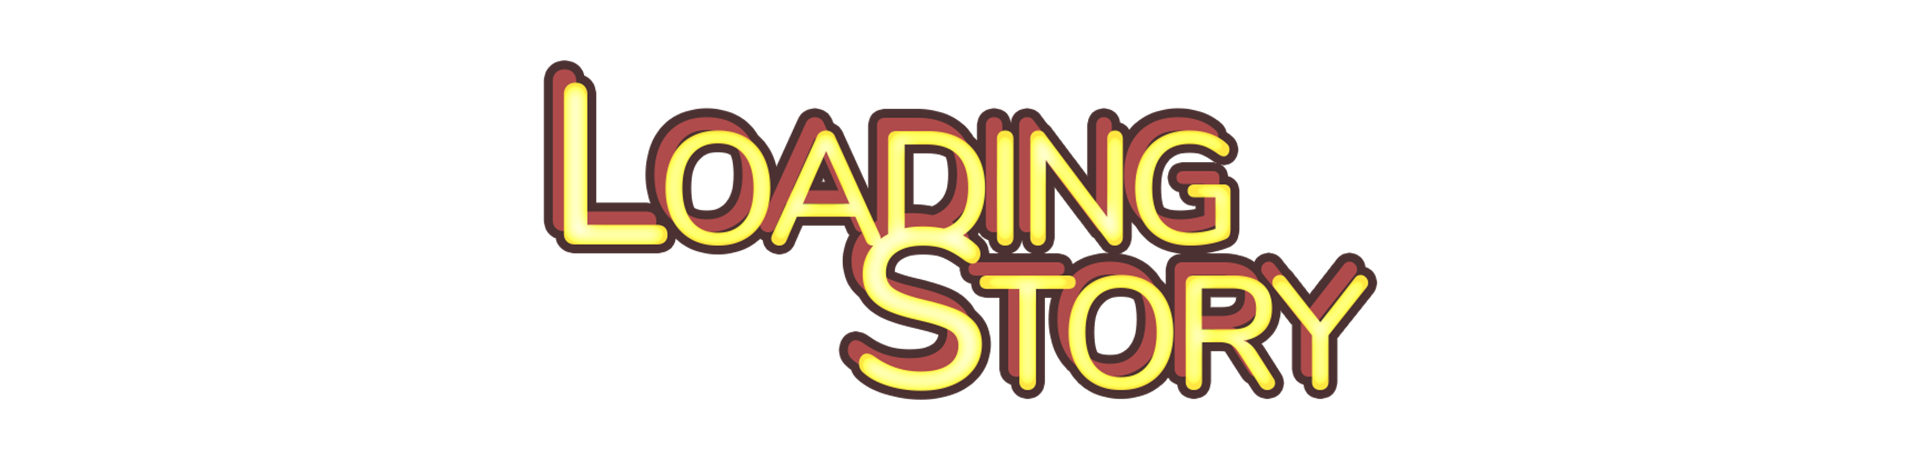 Loading Story